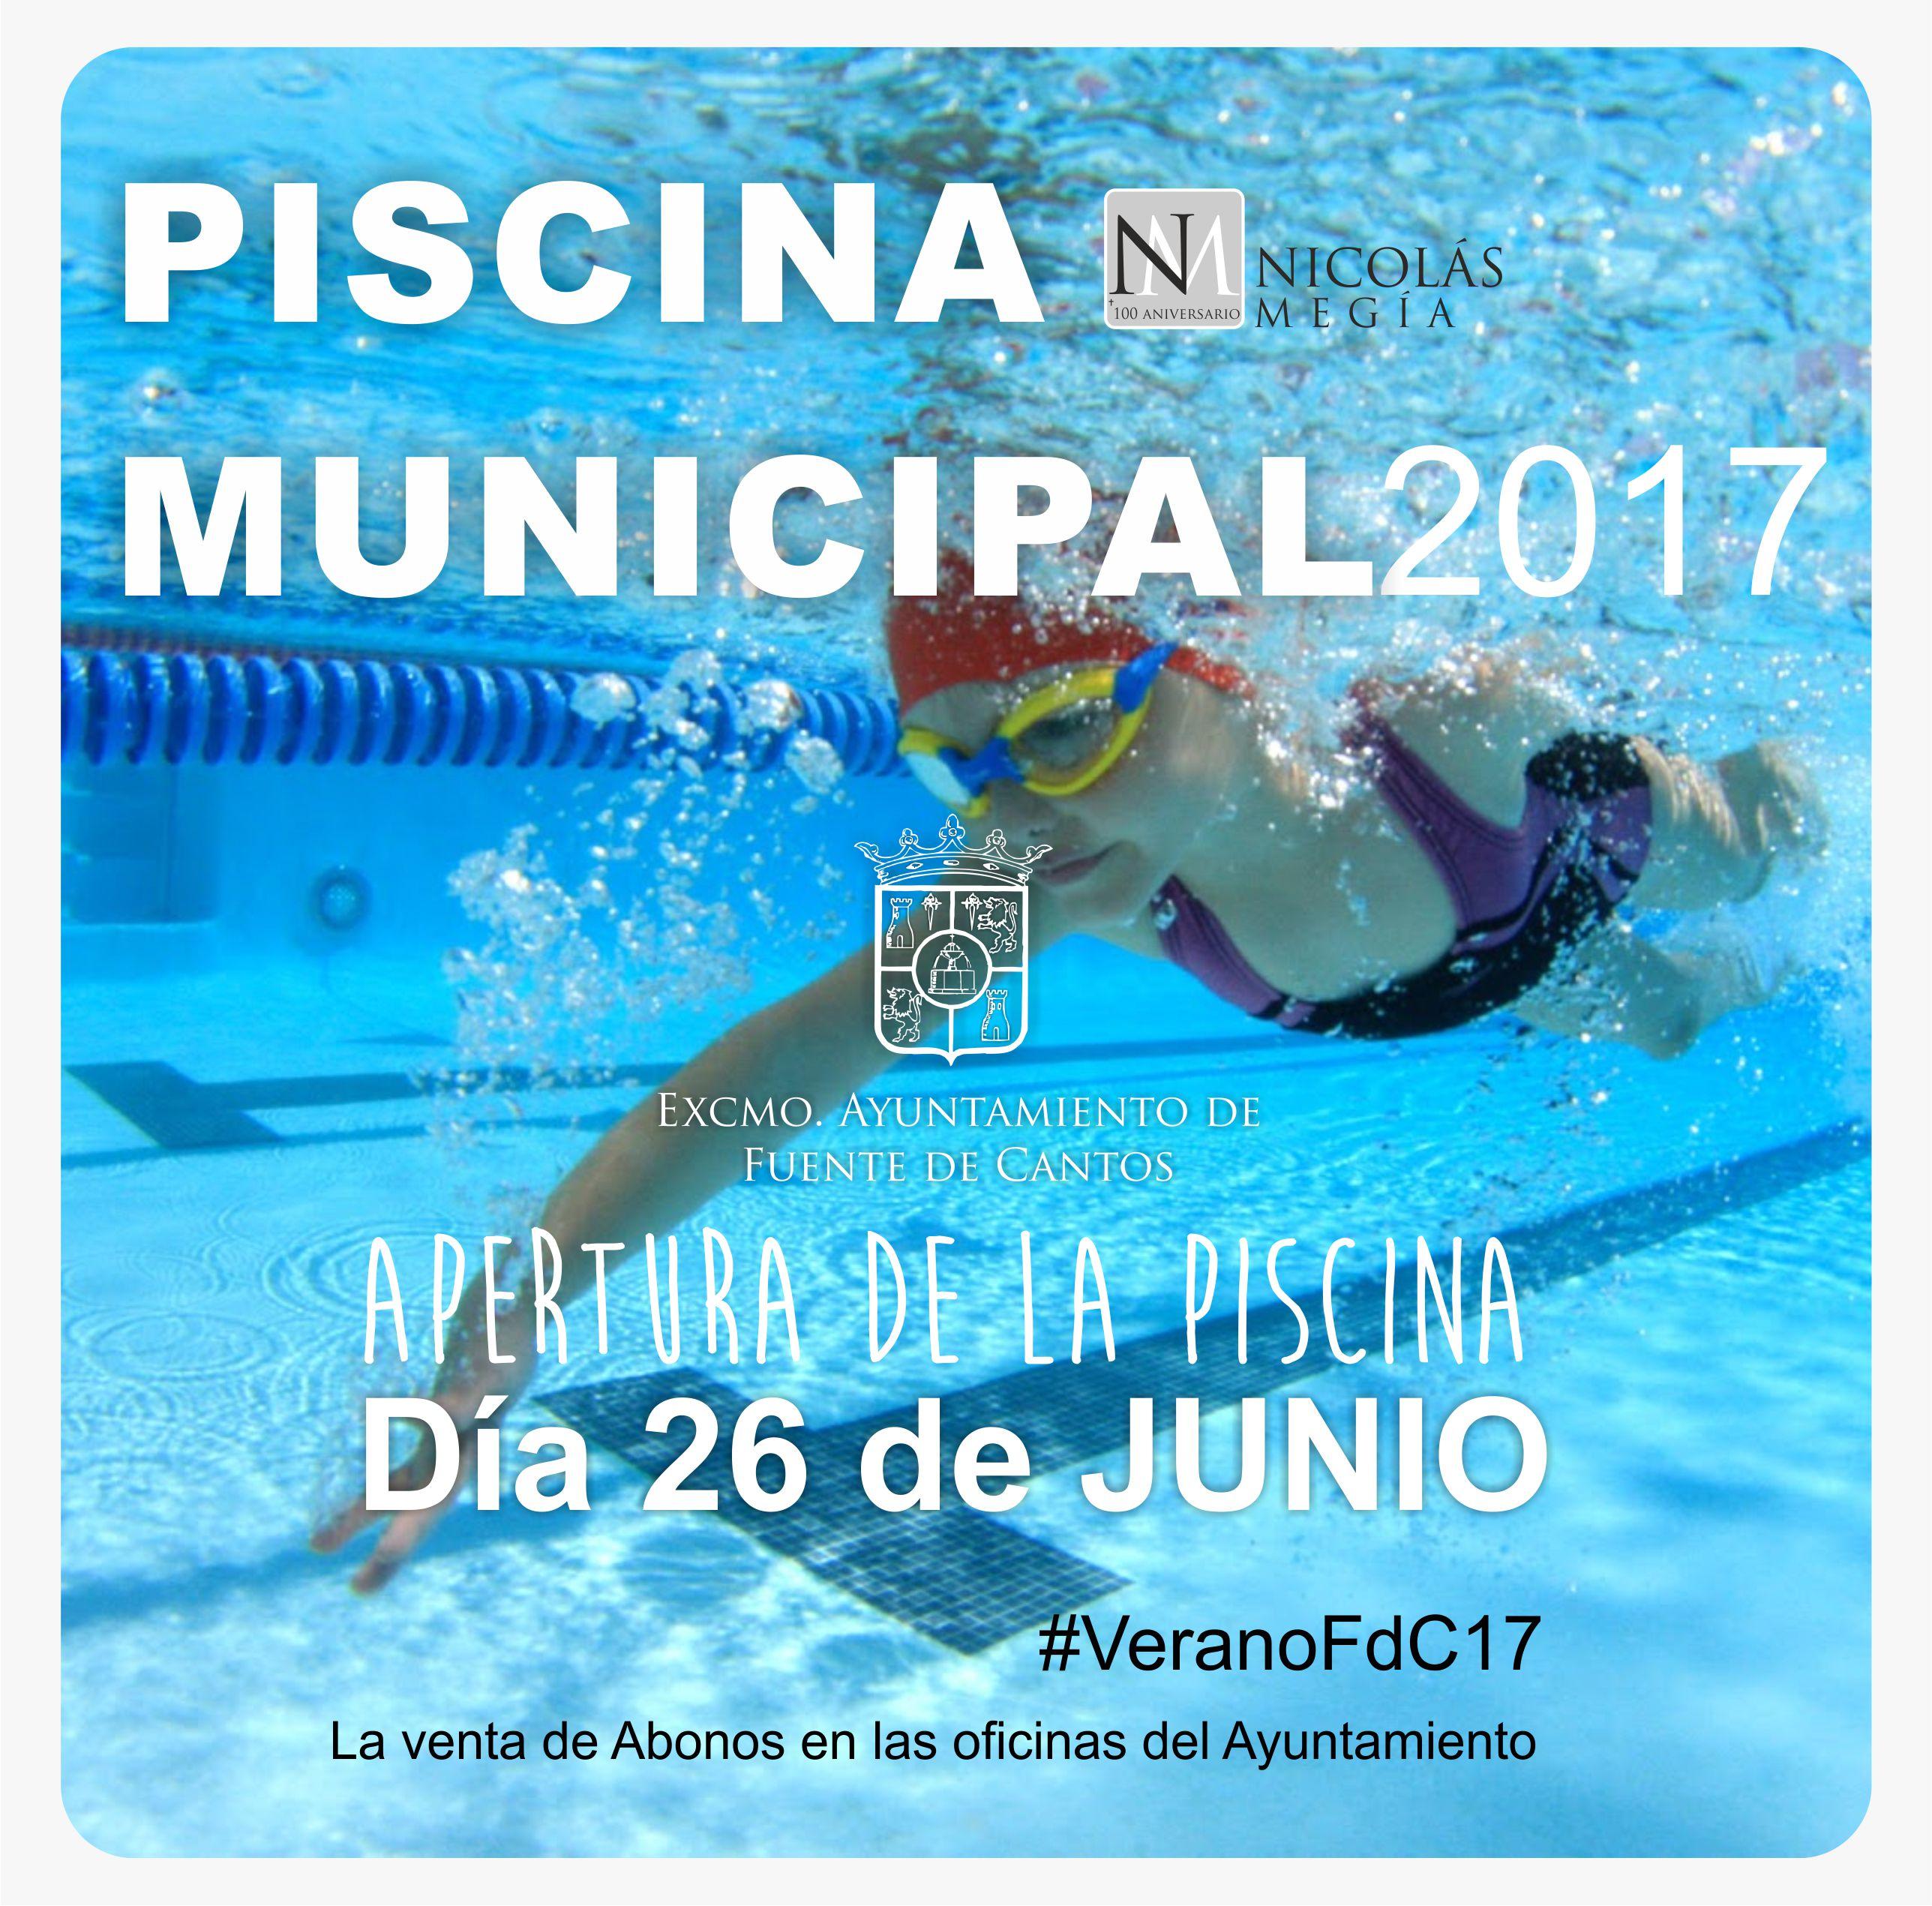 Piscina Mumnicipal